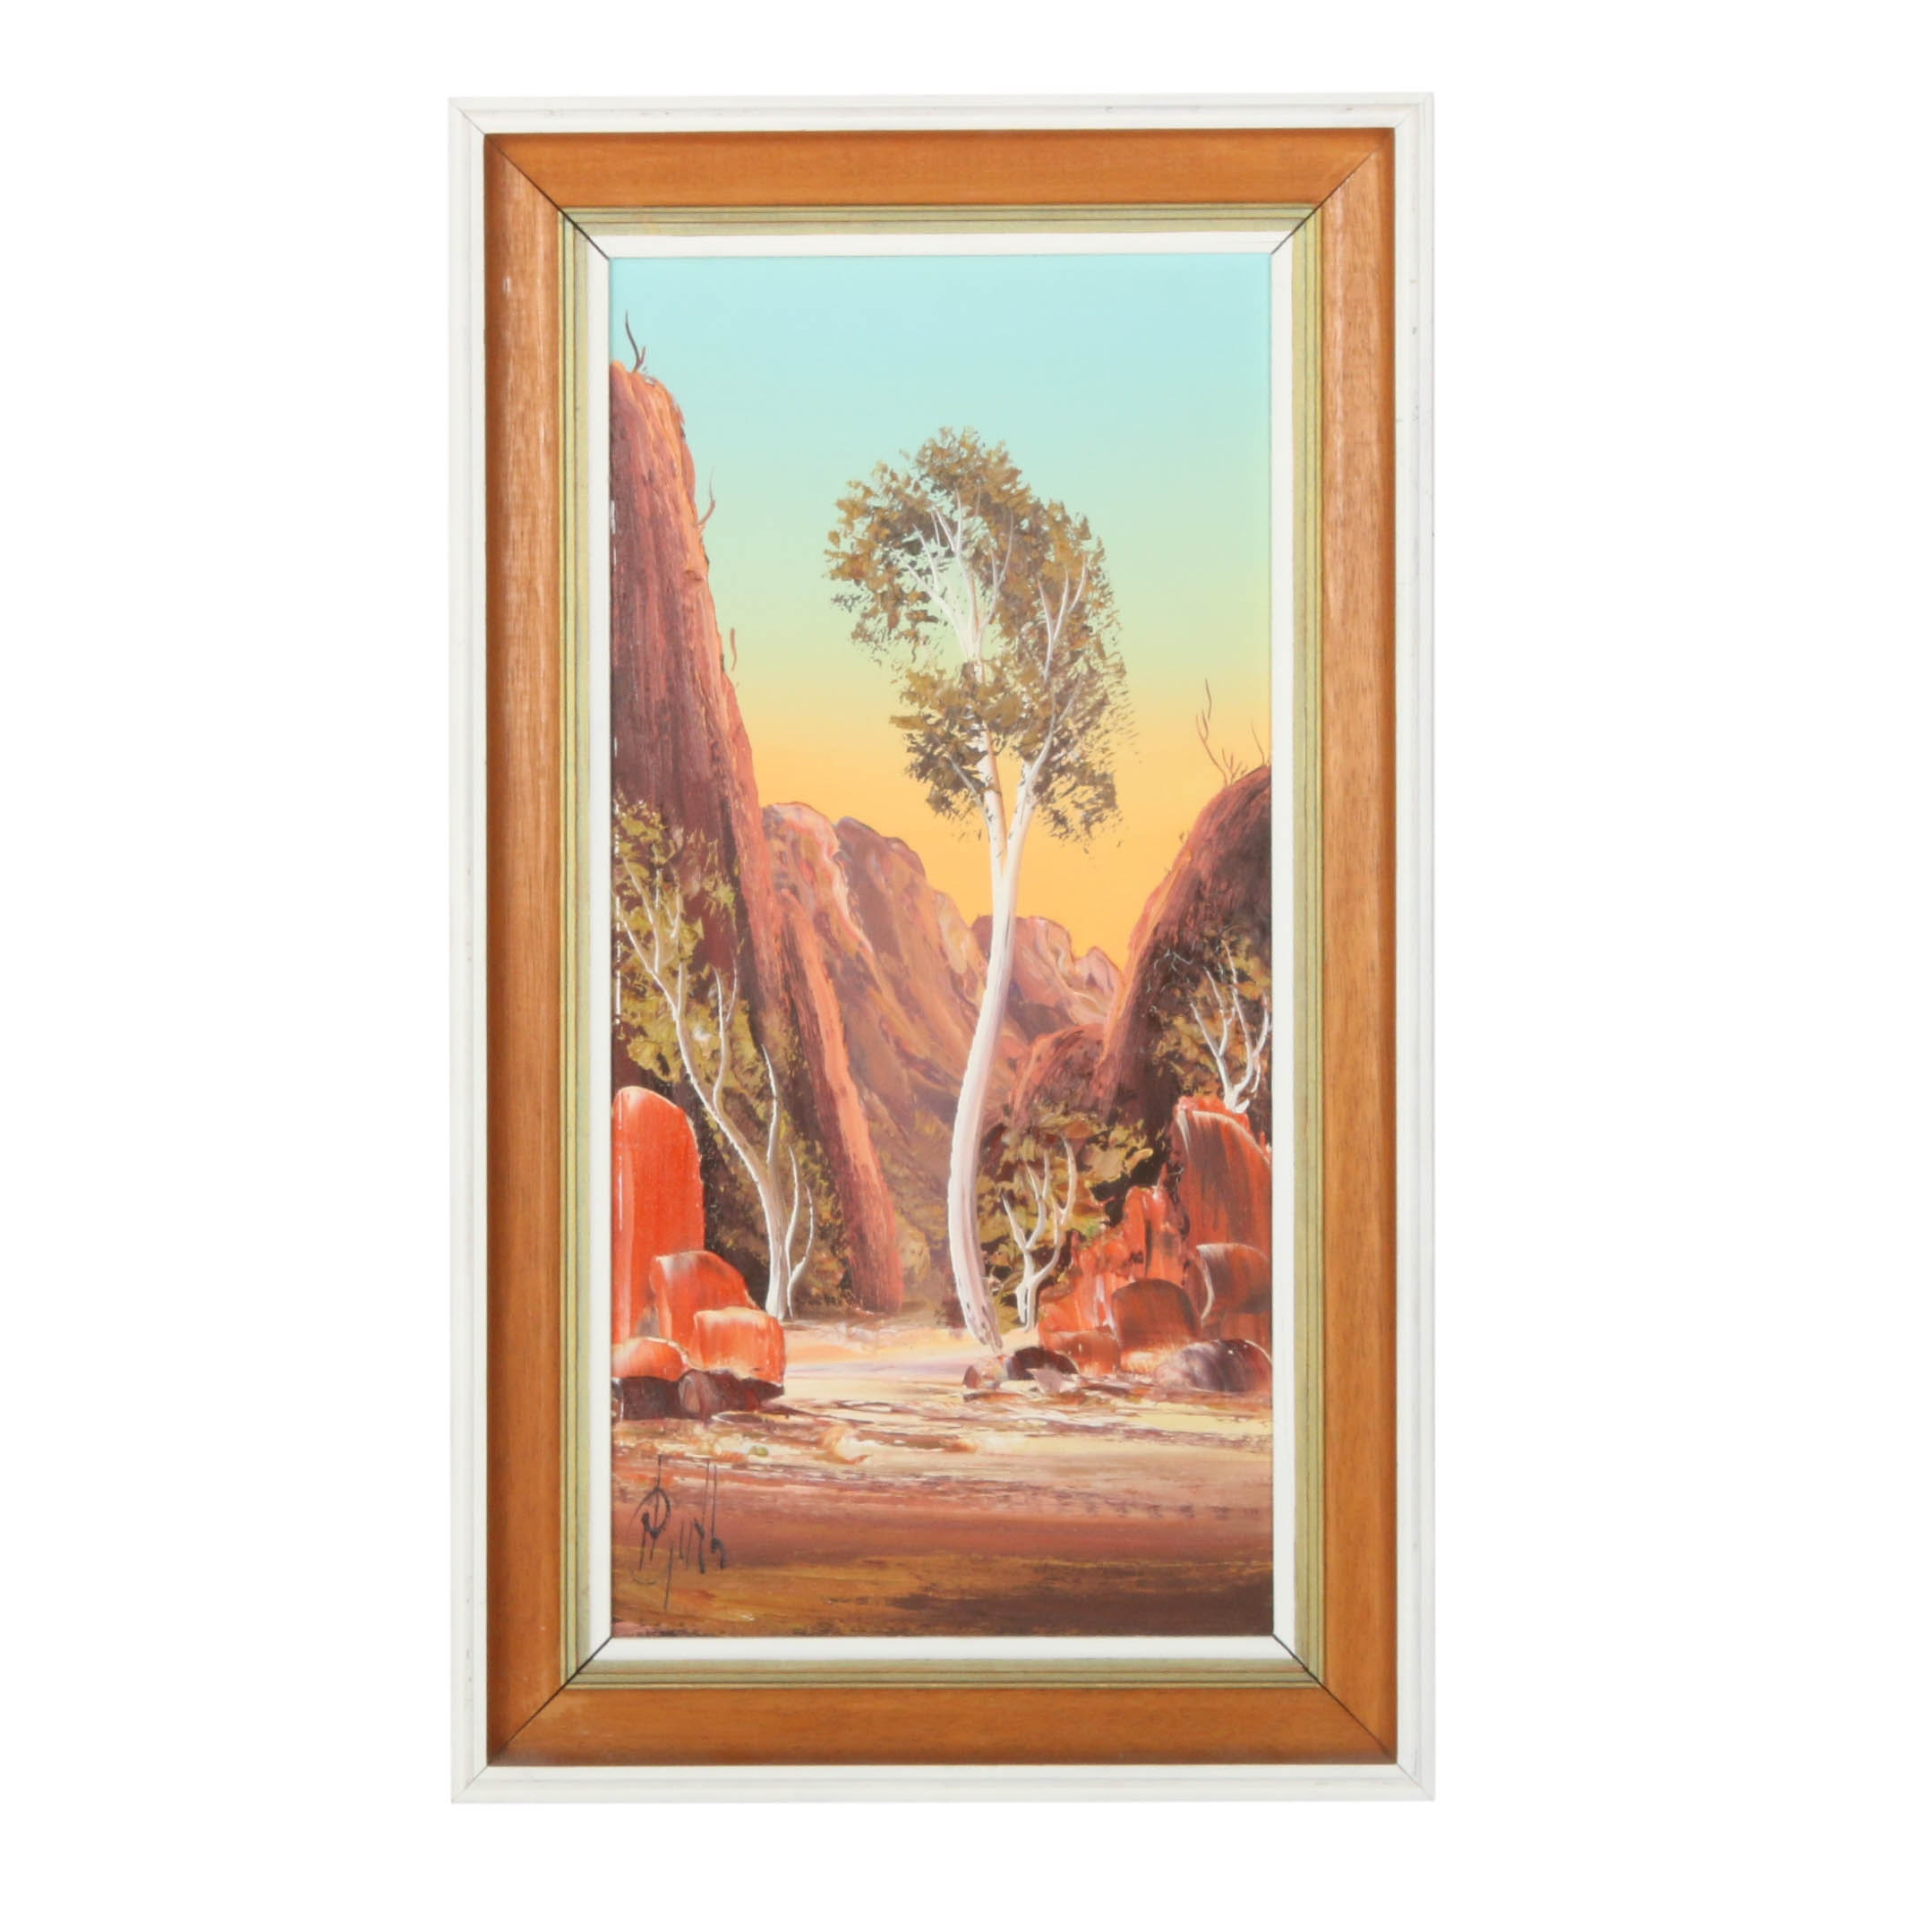 Late 20th Century Desert Landscape Oil Painting